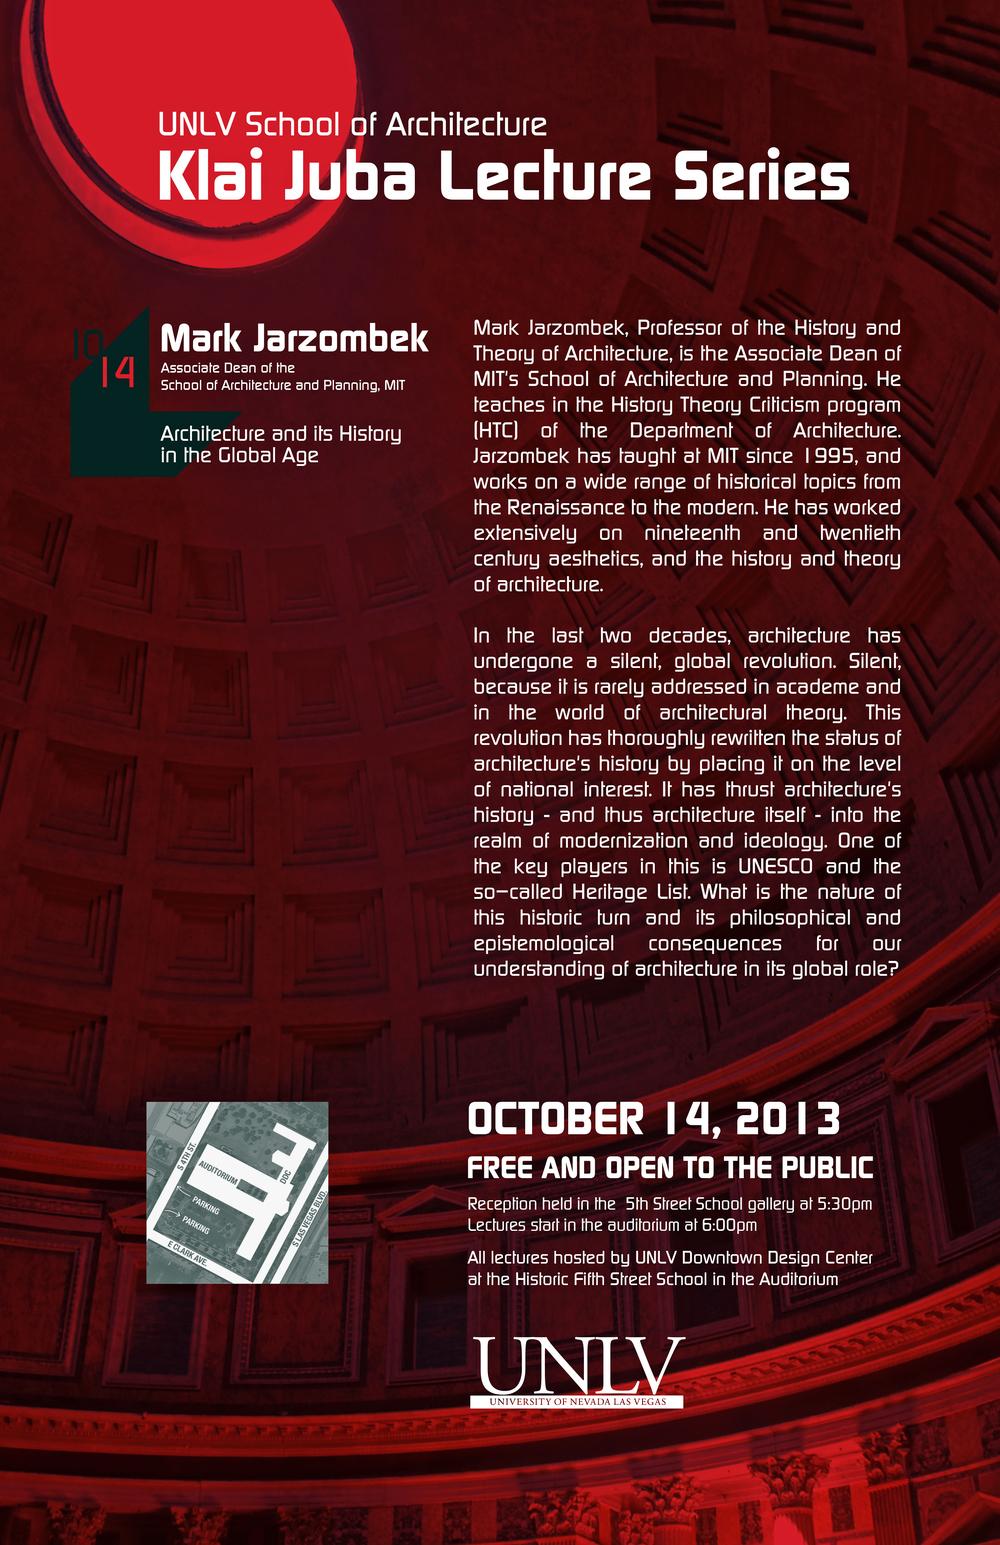 Mark Jarzombek Poster.jpg